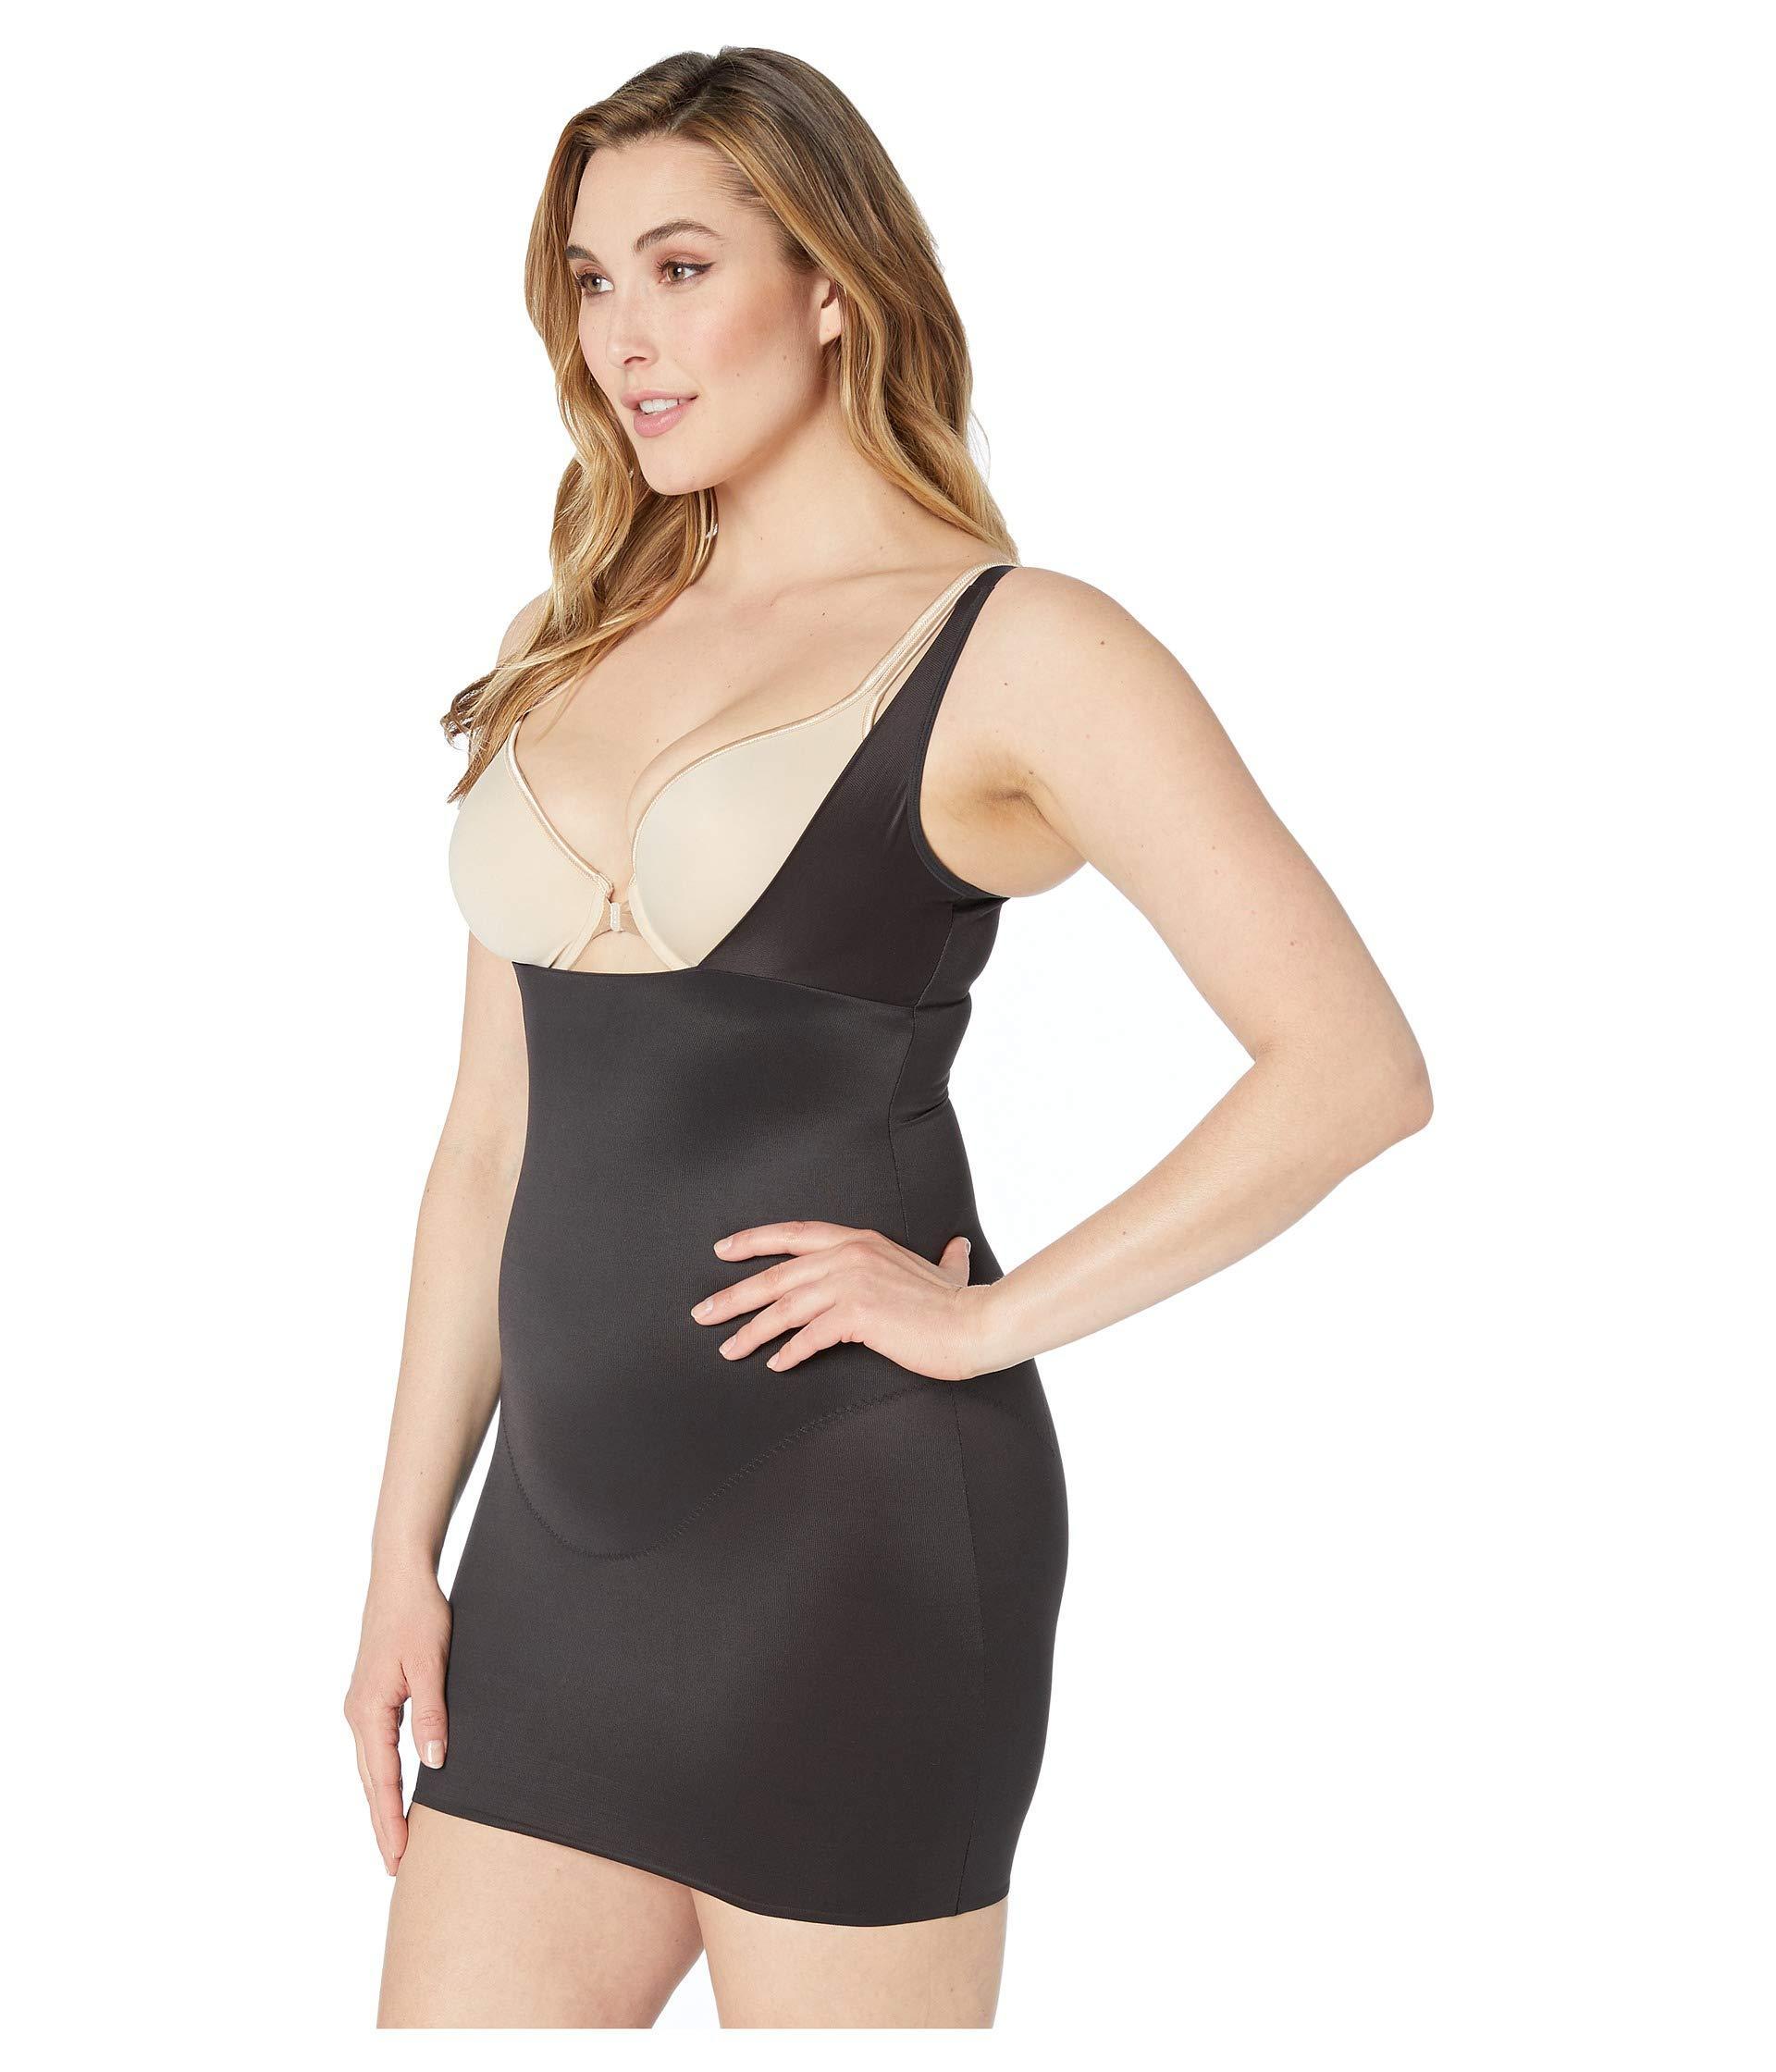 3dd1016fbfe Miraclesuit Plus Size Wear-your-own-bra Extra Firm Control Slip (black)  Women s Underwear in Black - Lyst